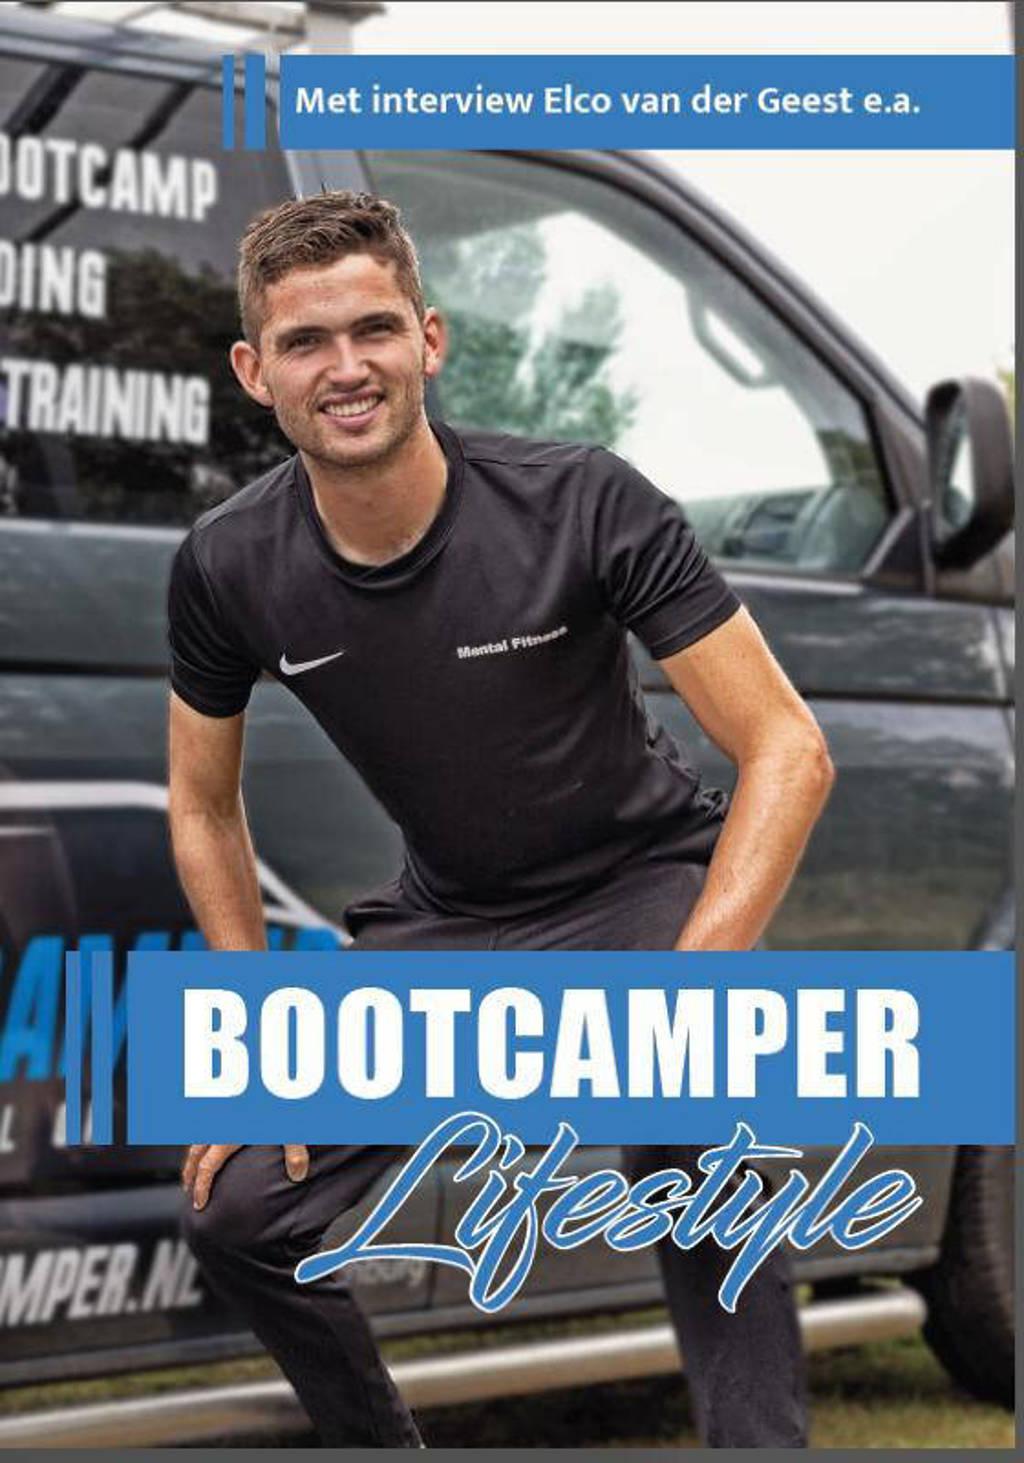 Bootcamper Lifestyle - Kees Aardenburg